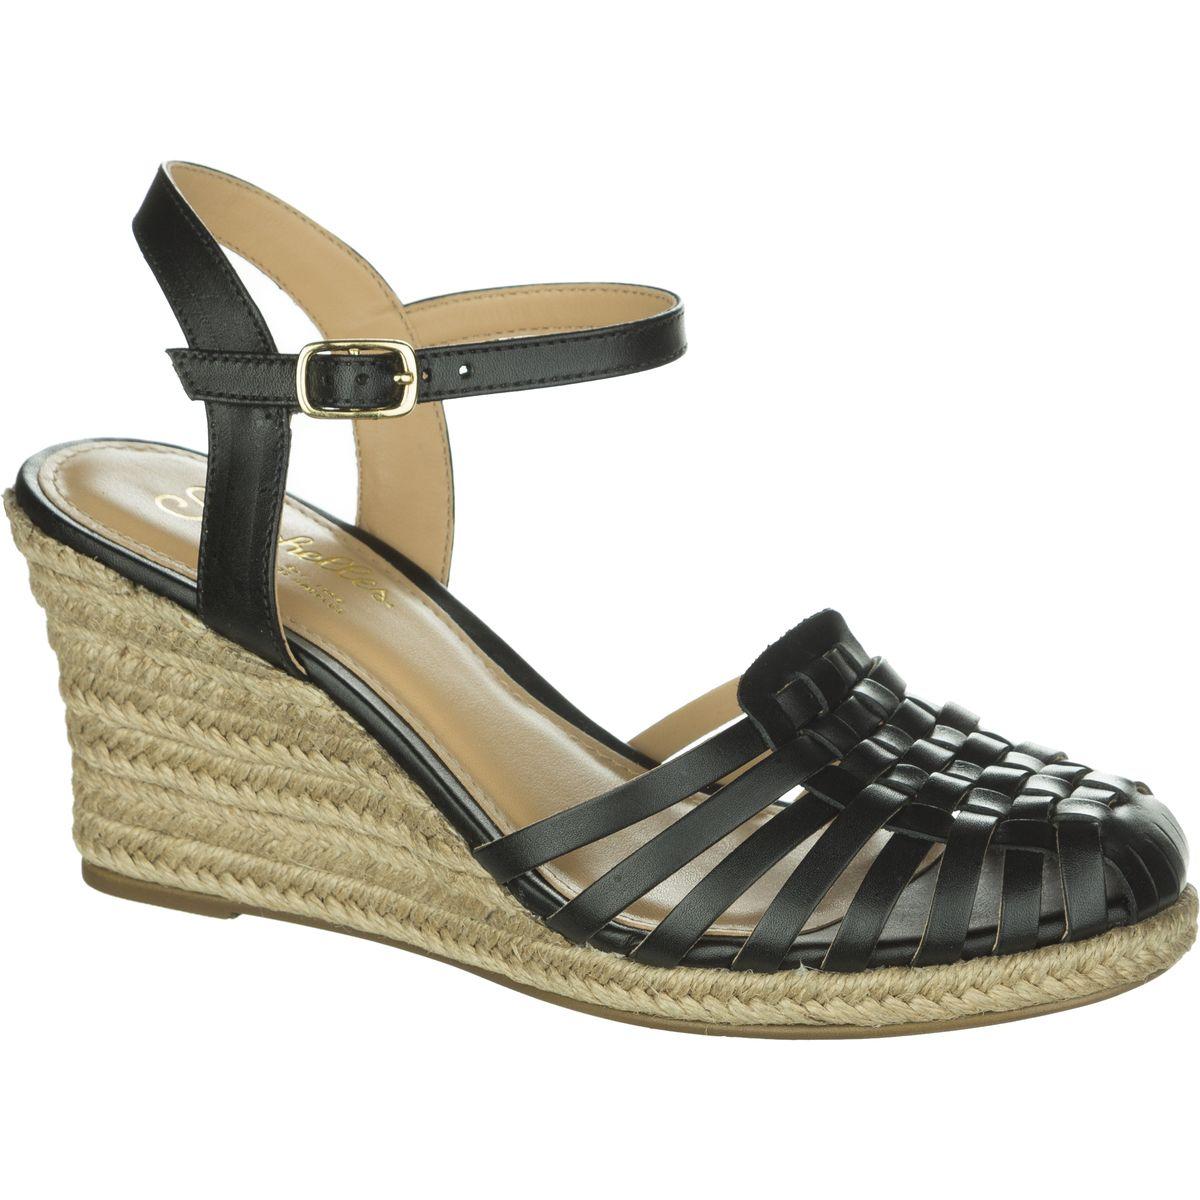 Seychelles Footwear Aspiration Shoe  Womens Black Leather 100